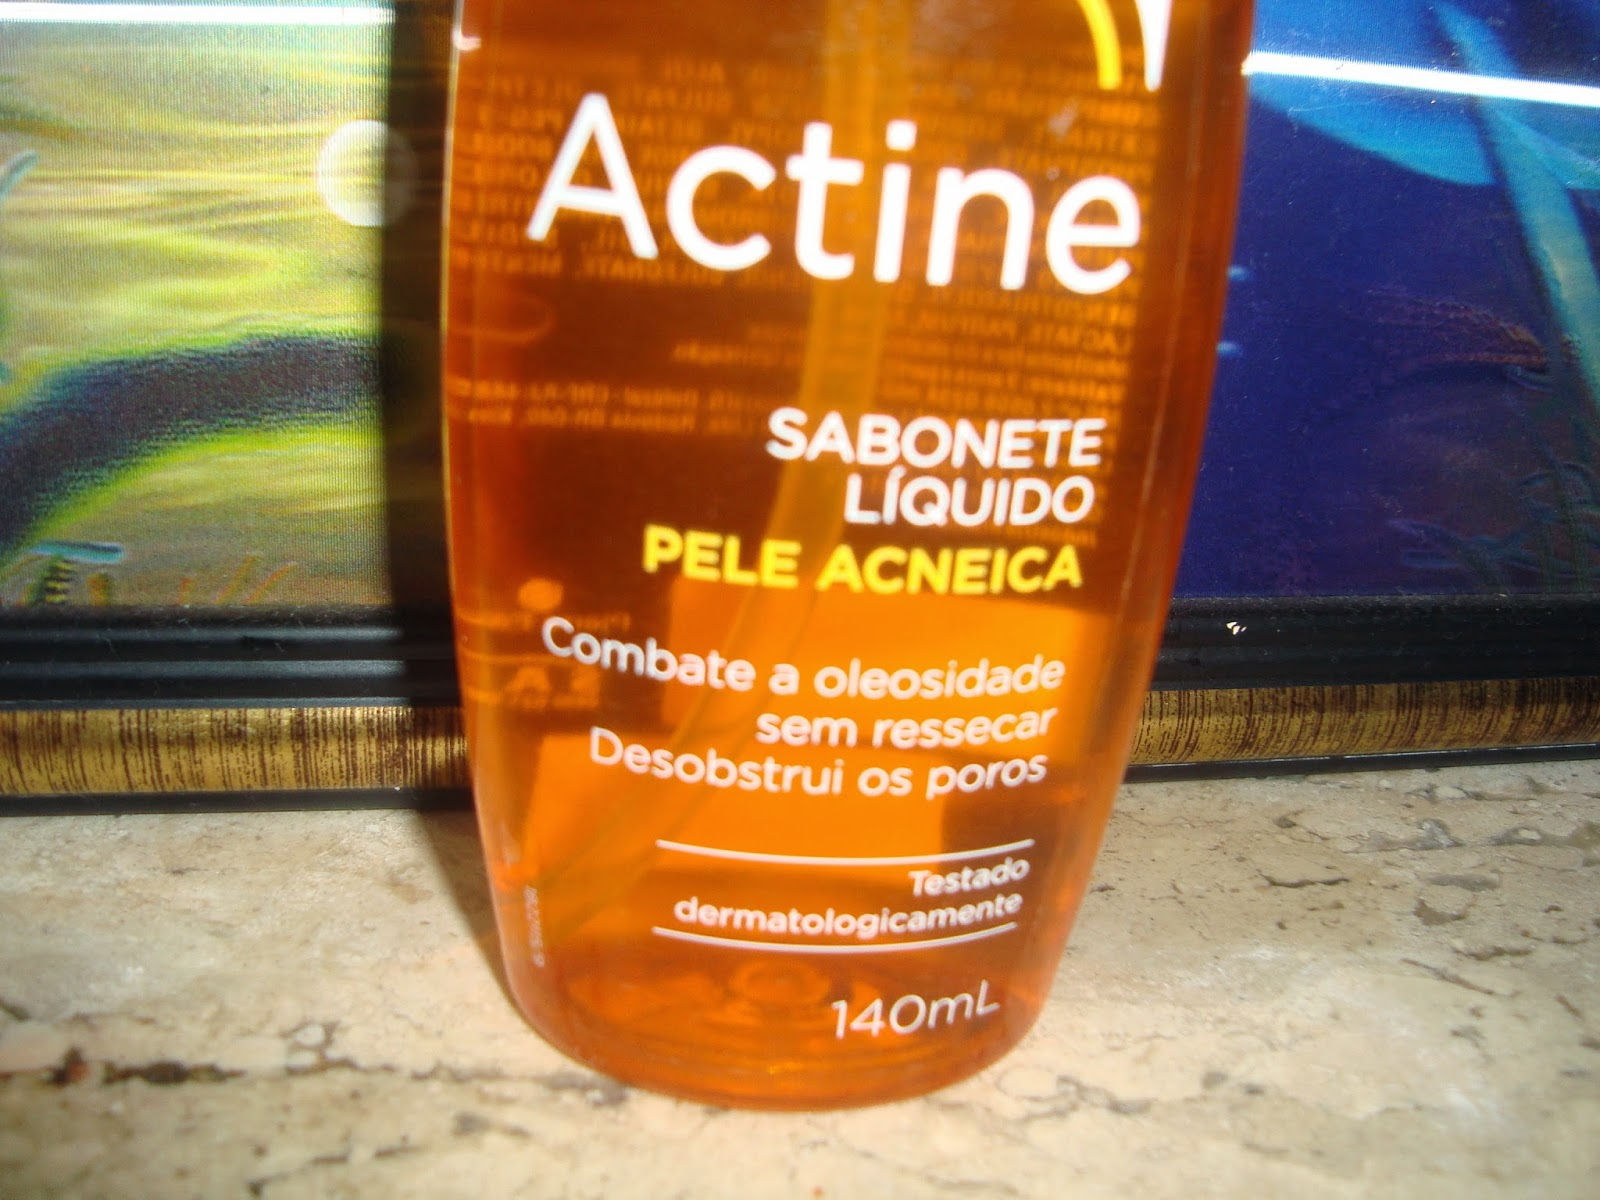 Sabonete liquido Actine